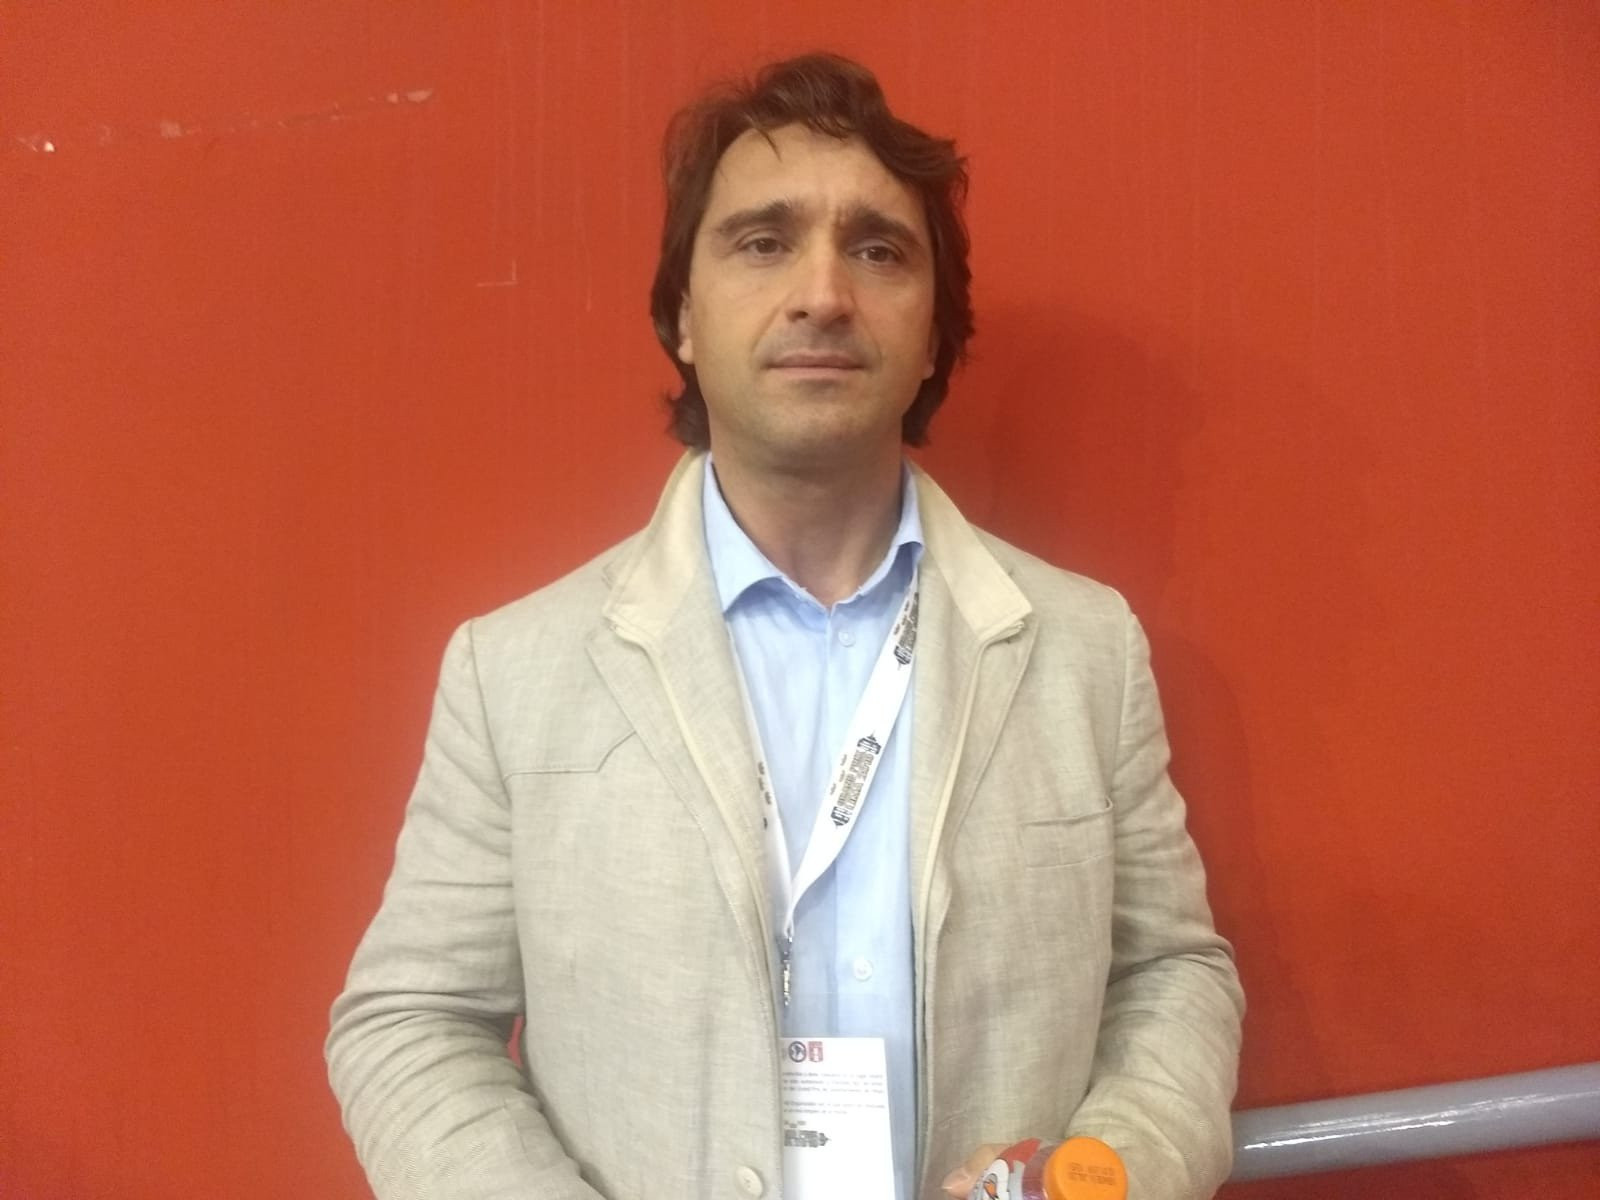 Maxim Agapitov is Interim President of the European Weightlifting Federation ©NTV